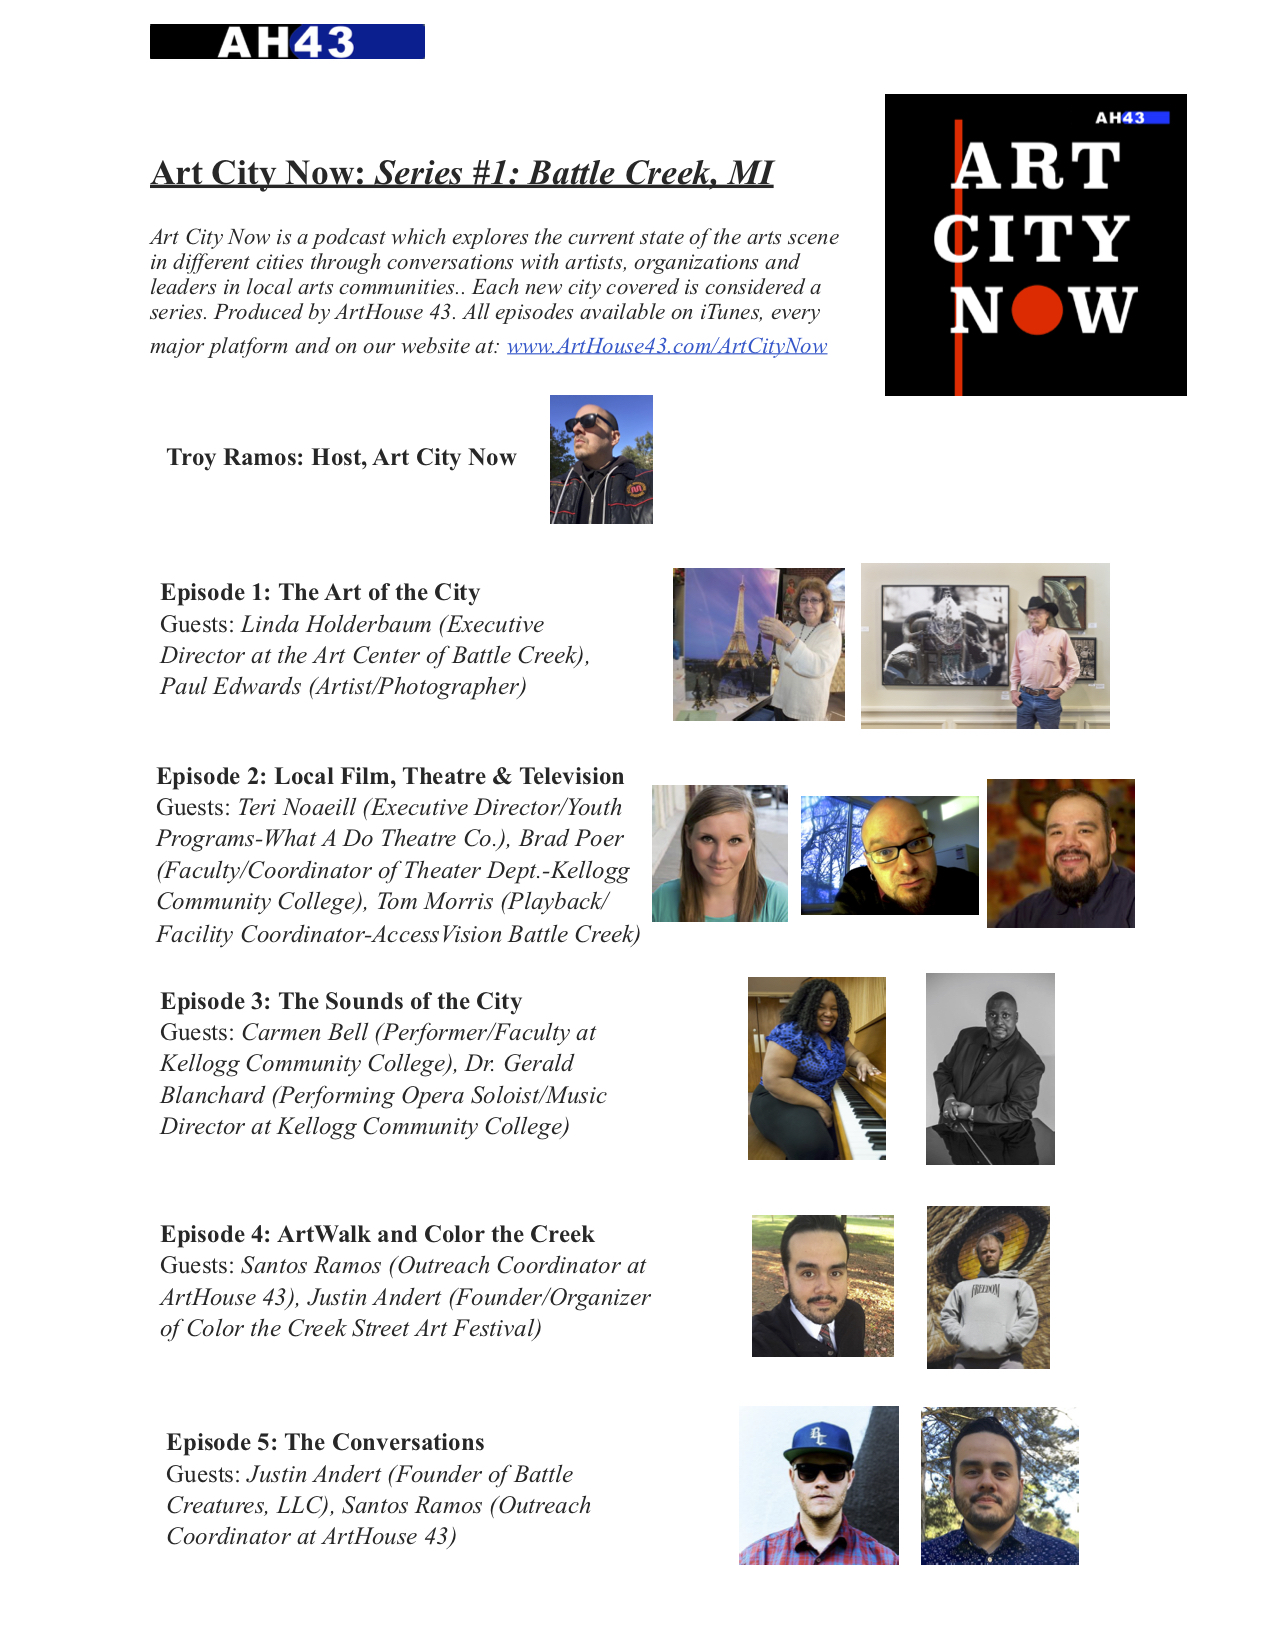 Art City Now Official Press Release P3.jpg